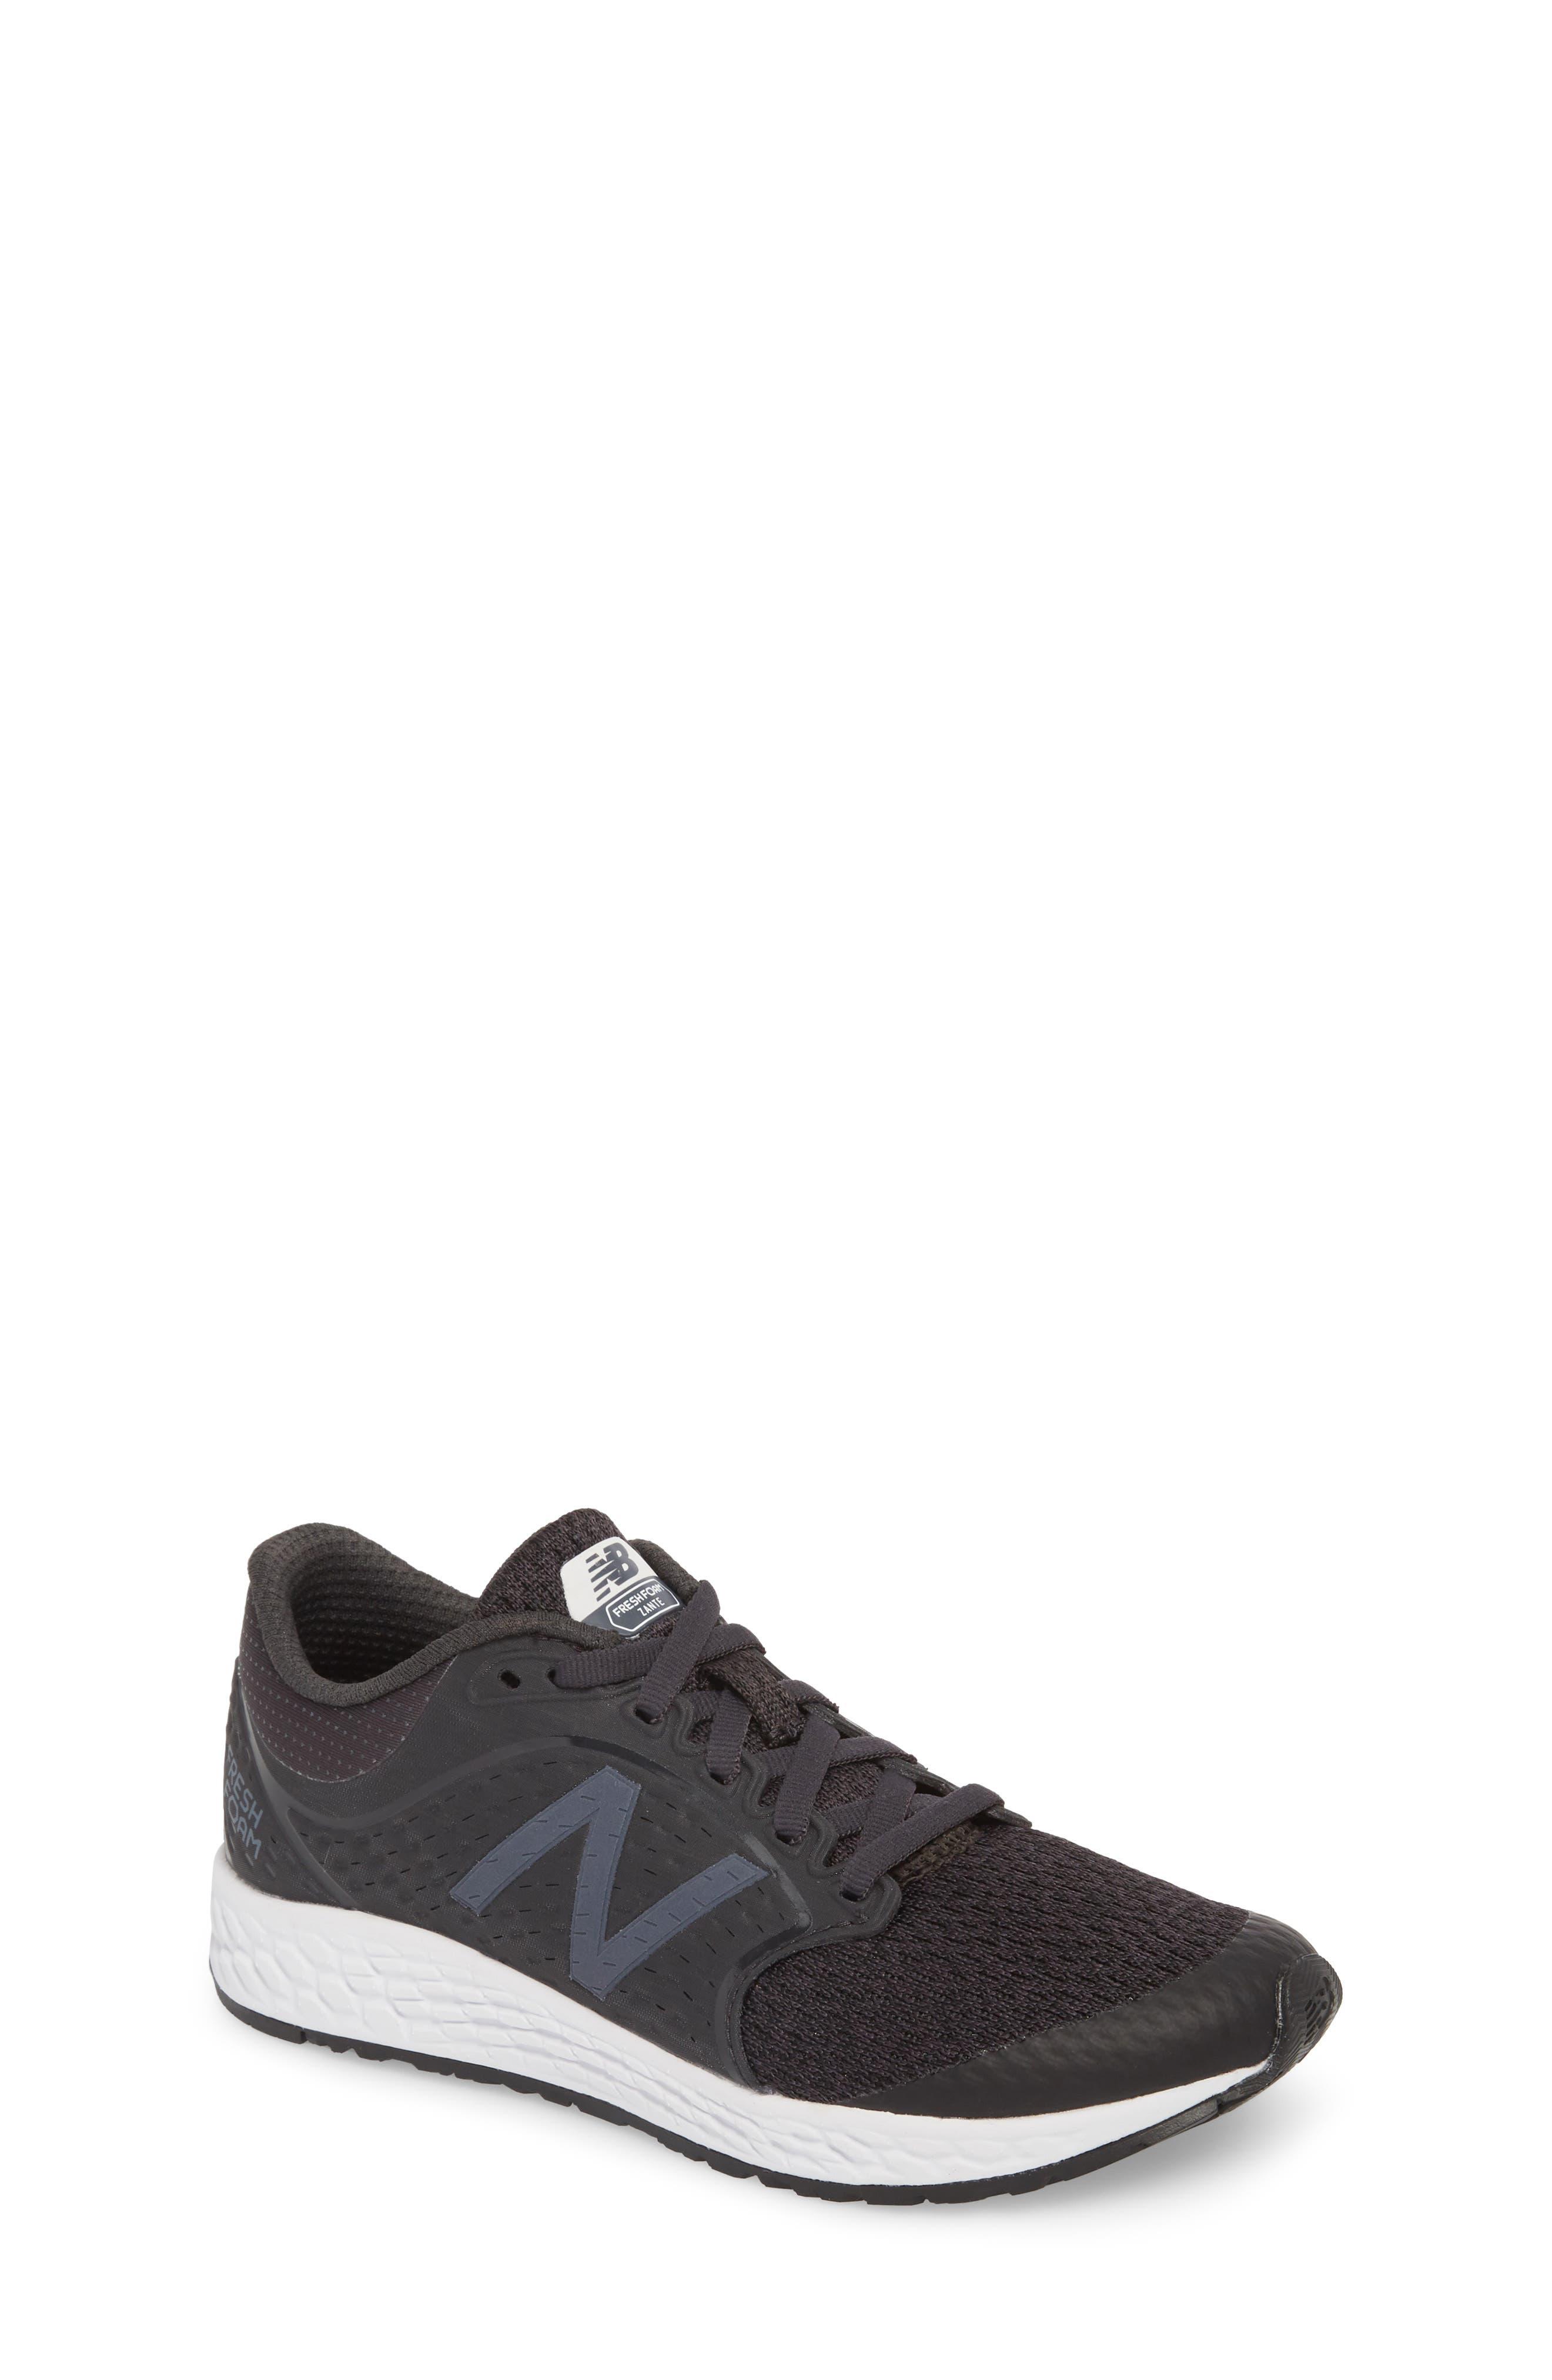 Fresh Foam Zante v4 Running Shoe,                             Main thumbnail 1, color,                             001